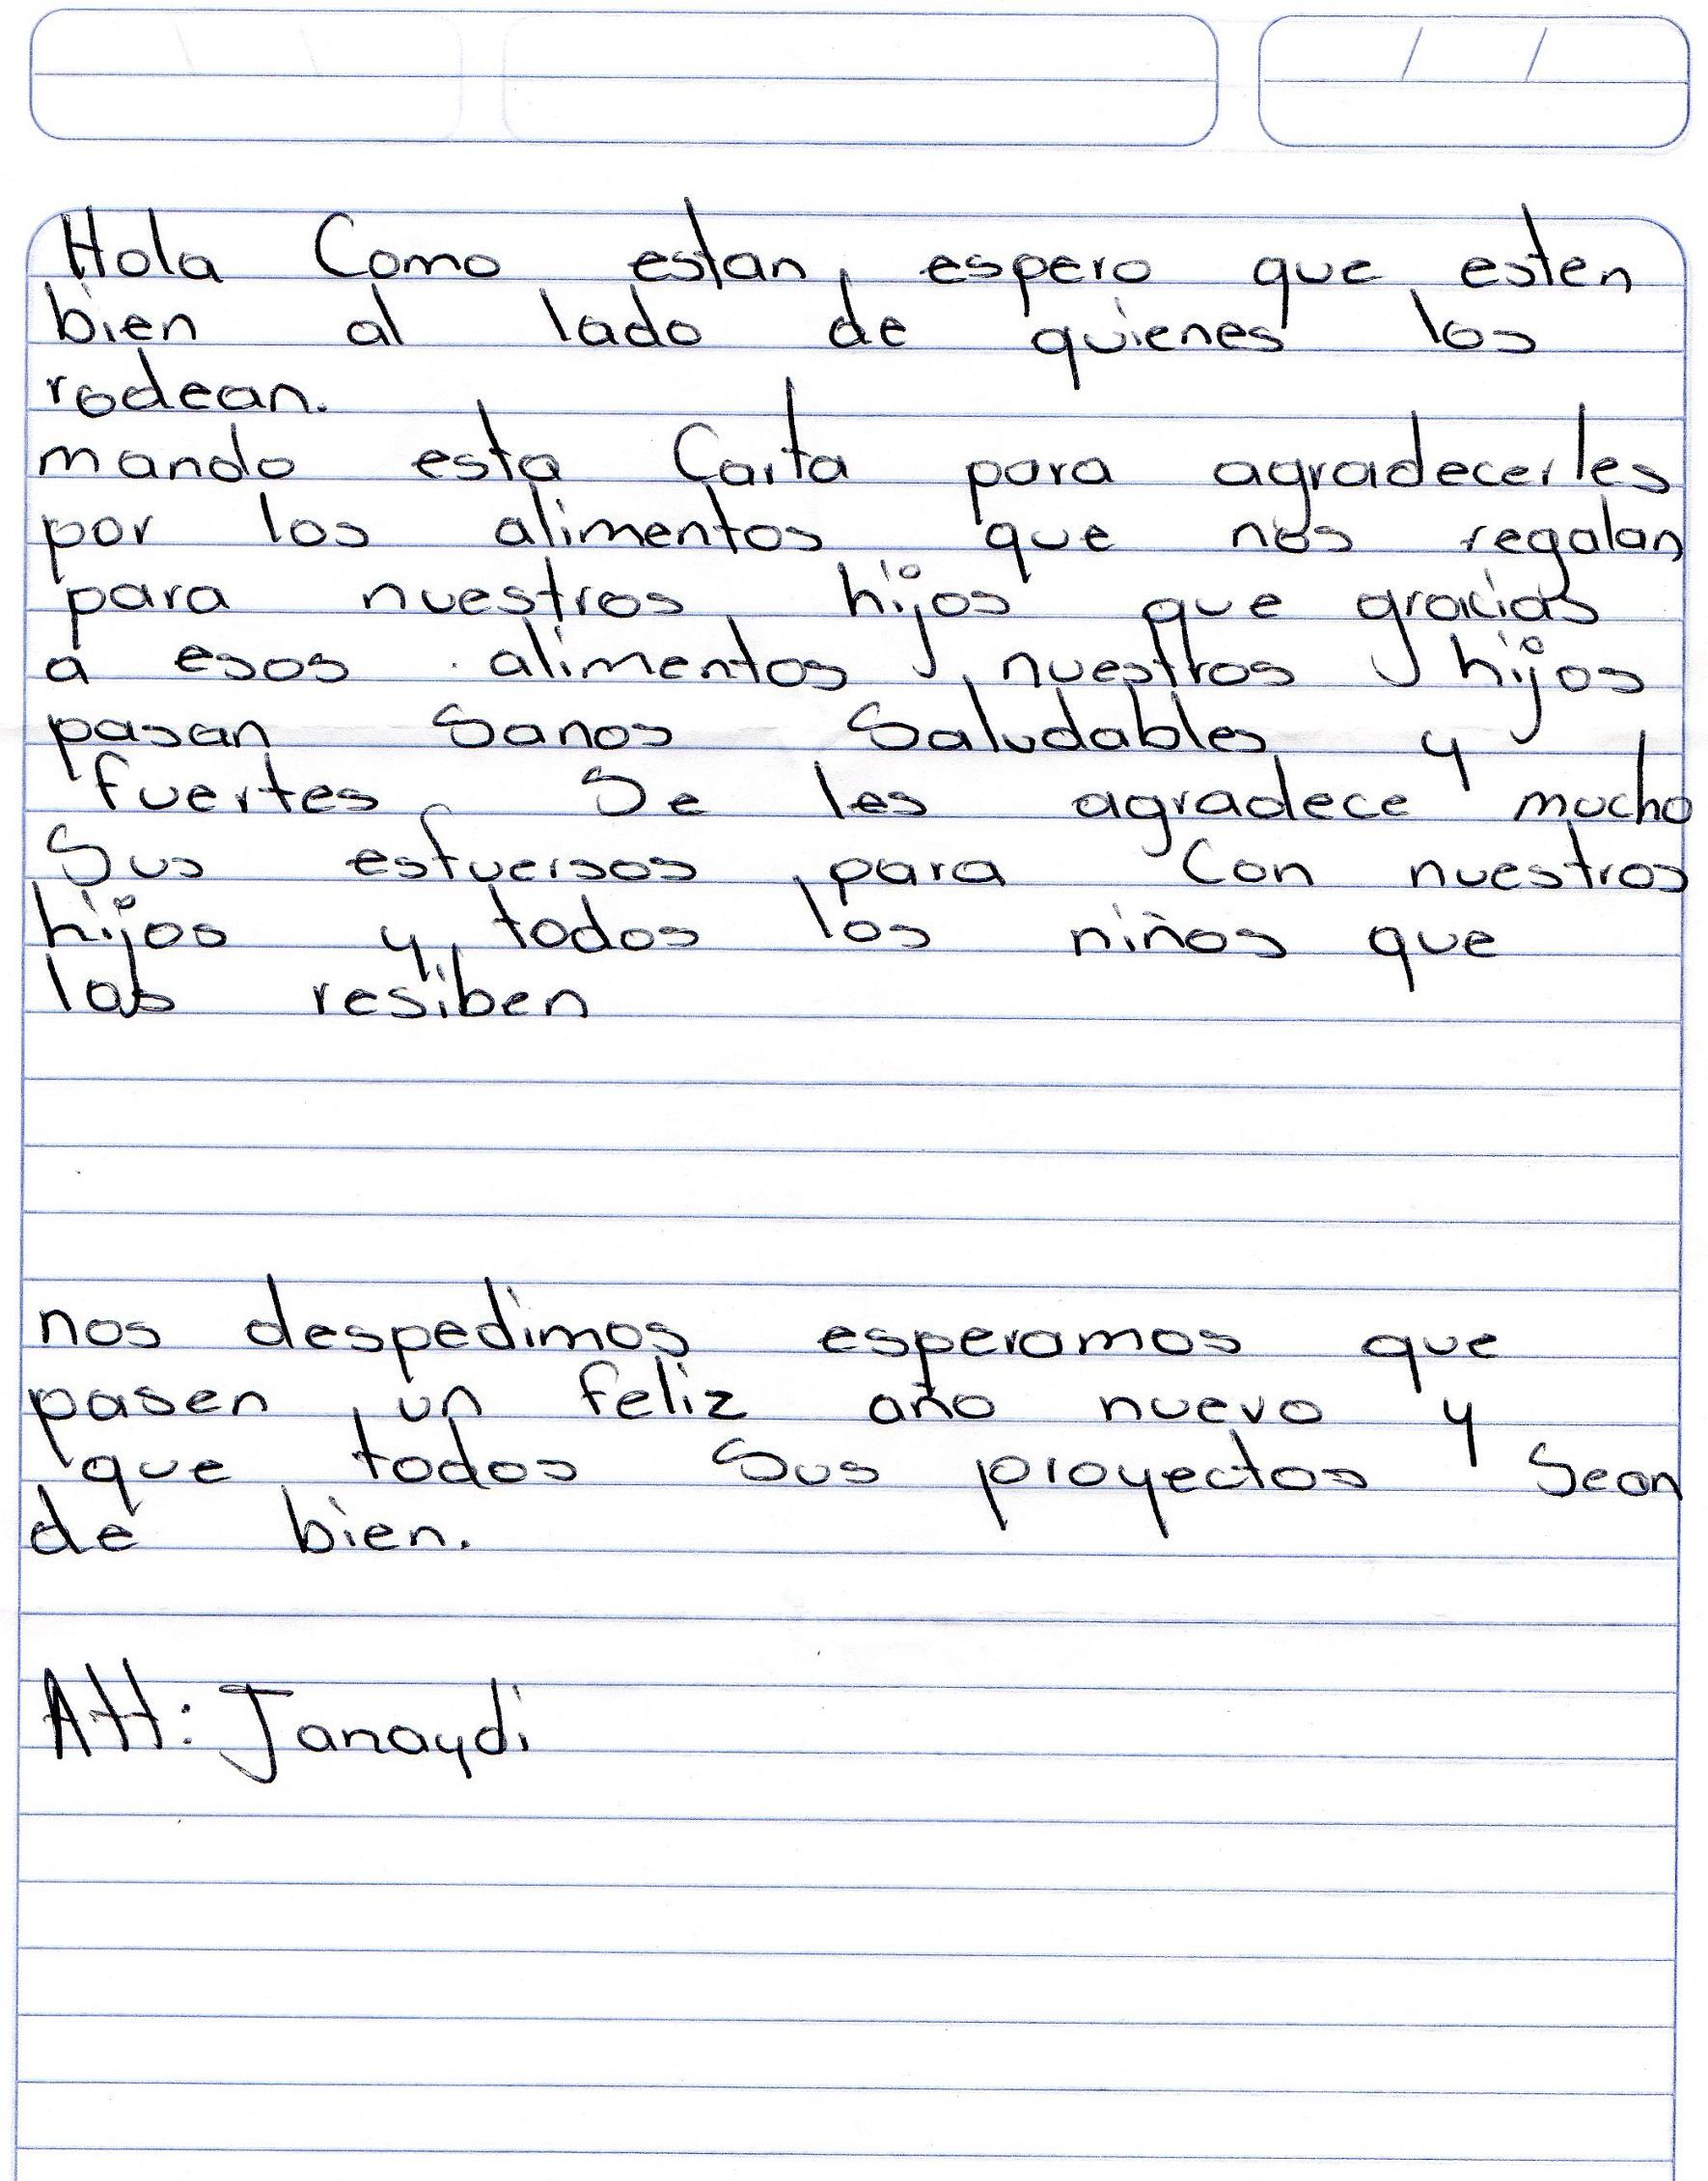 Monjaras-4-10-2016-letter-edited